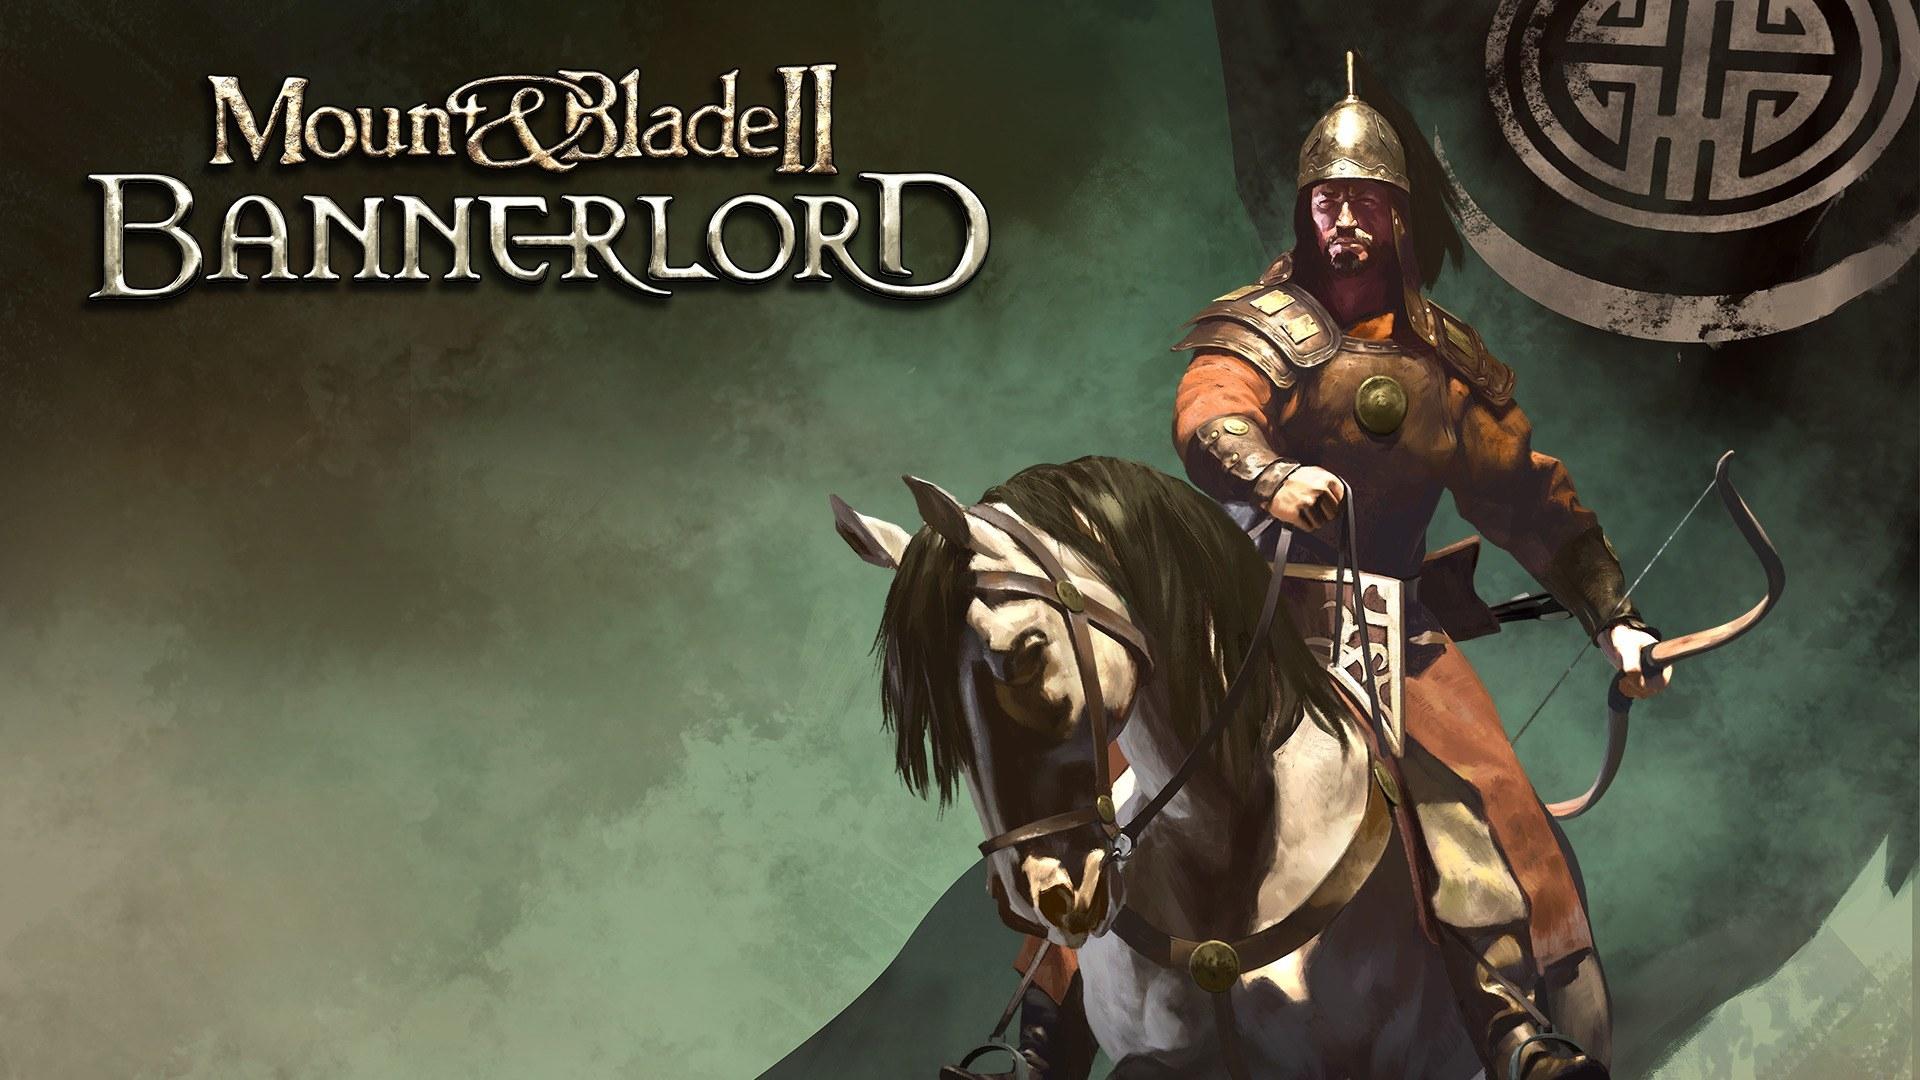 Mount Blade 2 Bannerlord Wallpaper Hd Games 4k Wallpapers